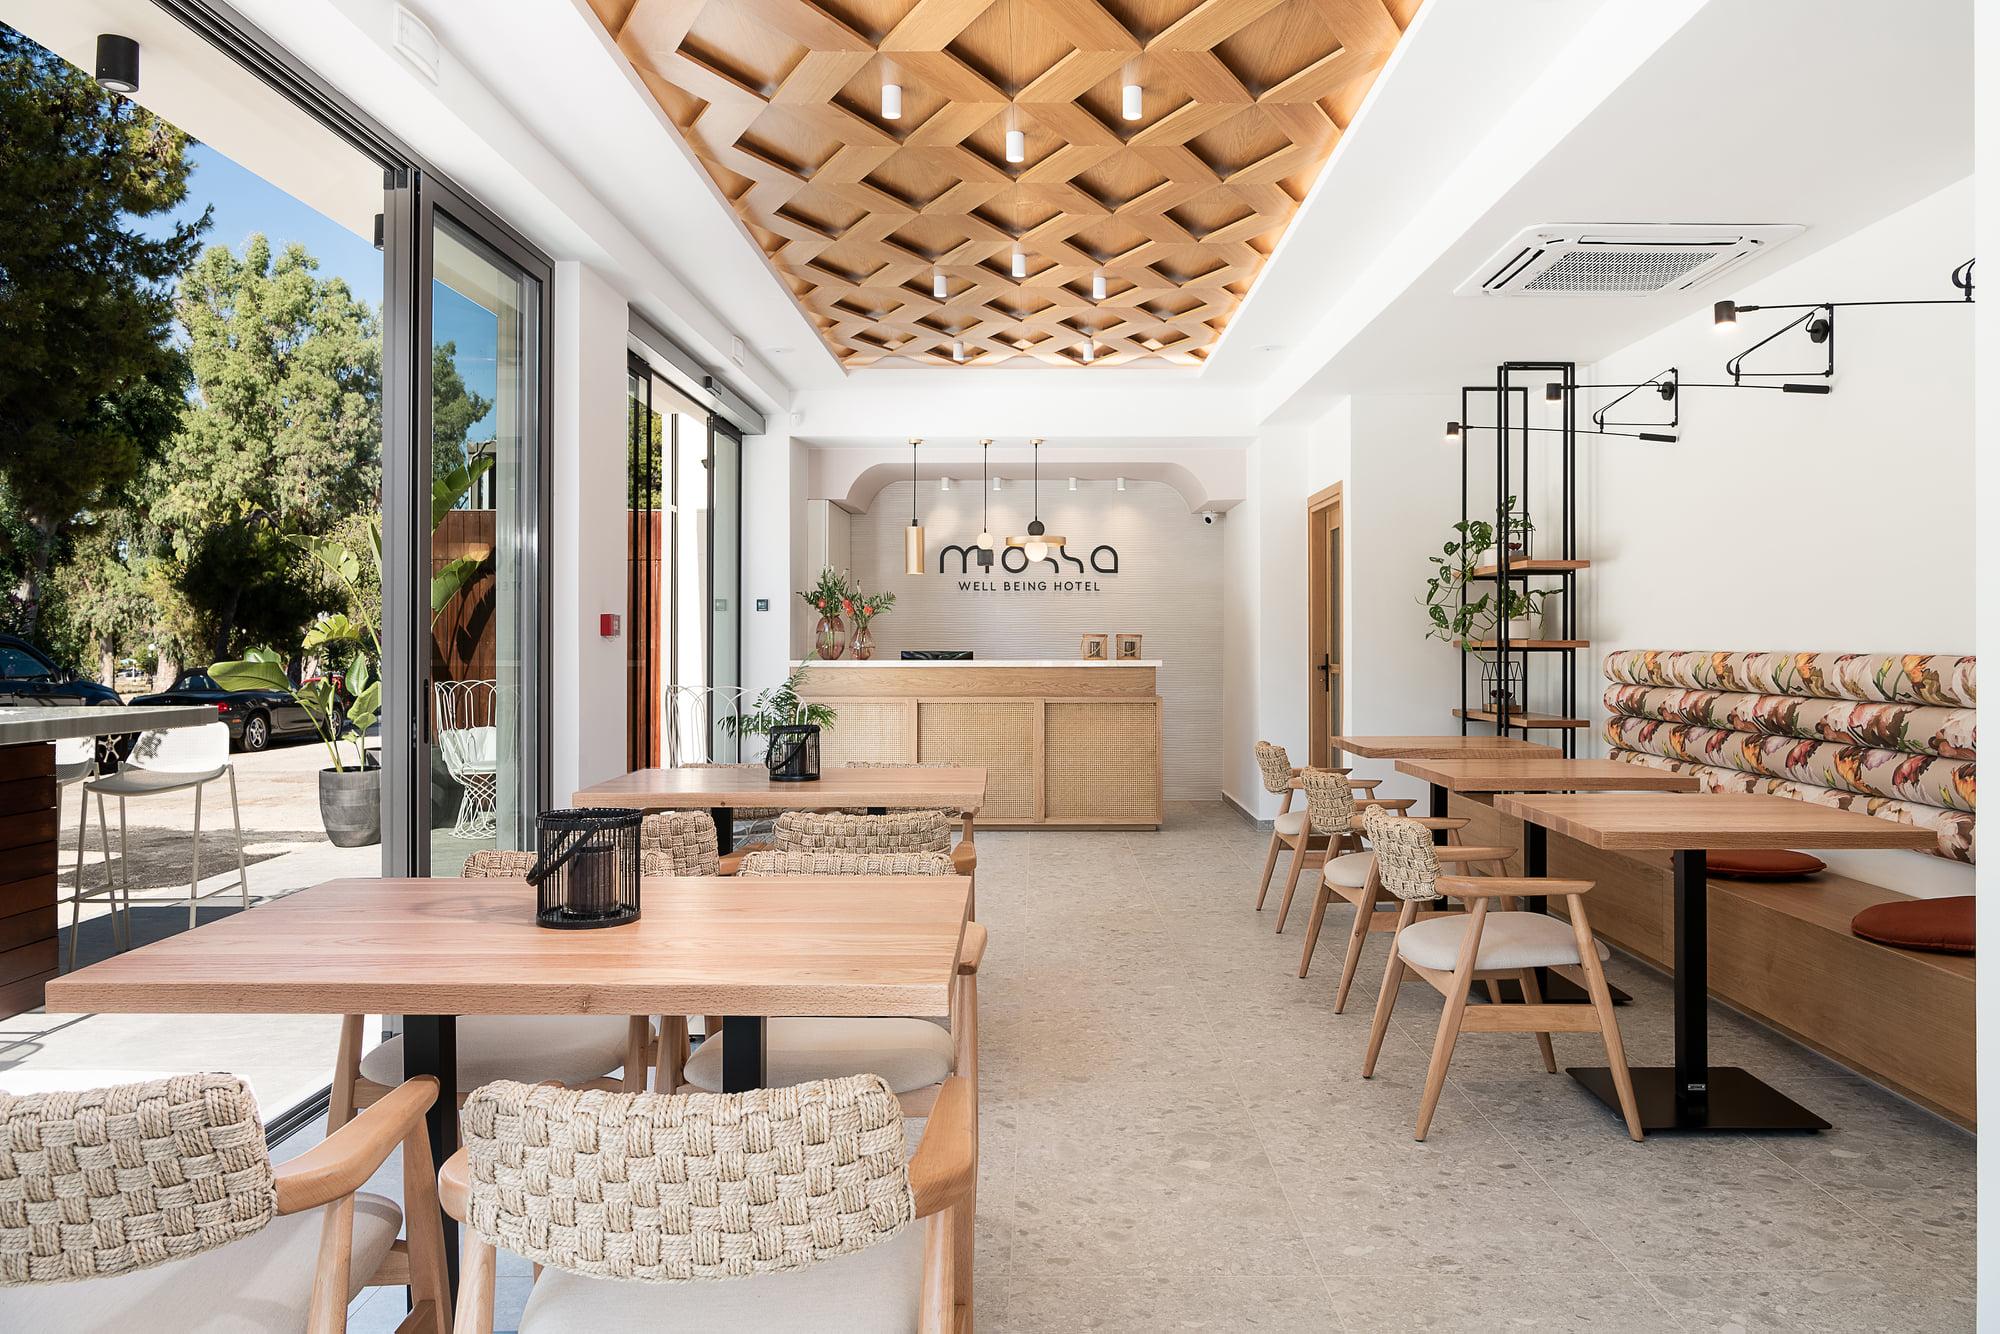 Mossa Well Being Hotel - Αγίους Αποστόλους, Χανιά